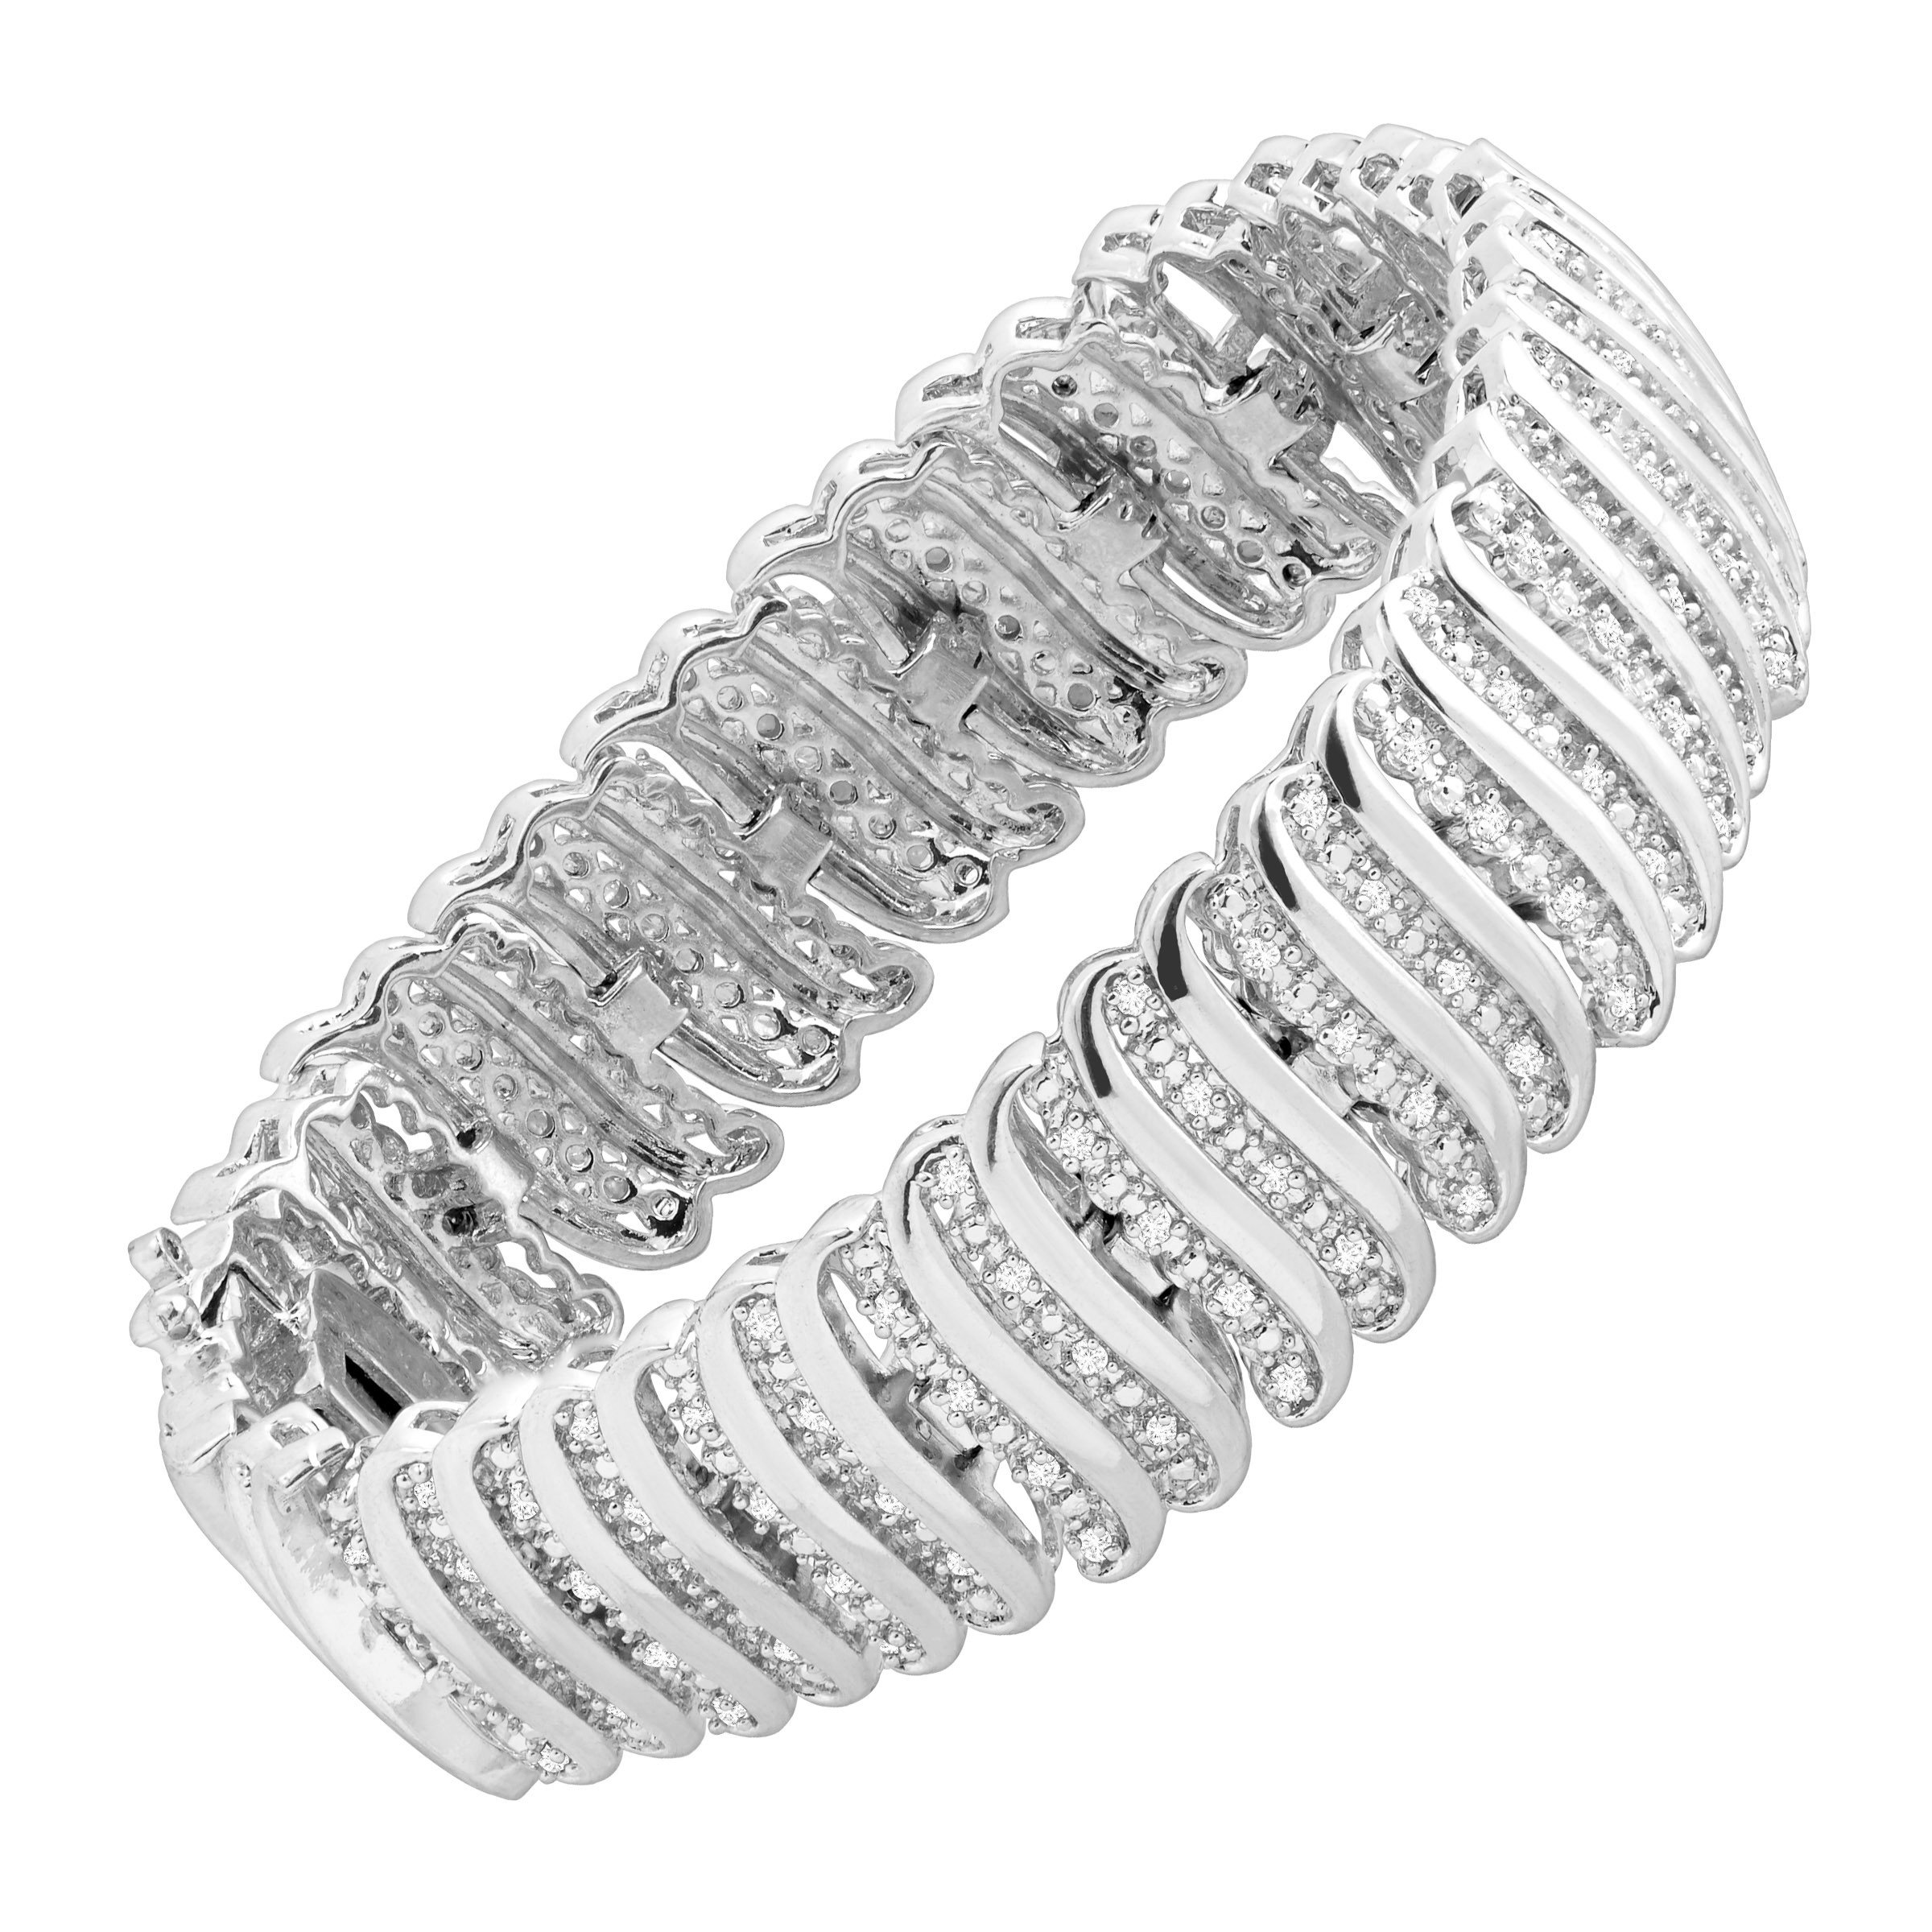 2 ct Diamond 'S' Link Tennis Bracelet in Sterling Silver-Plated Brass